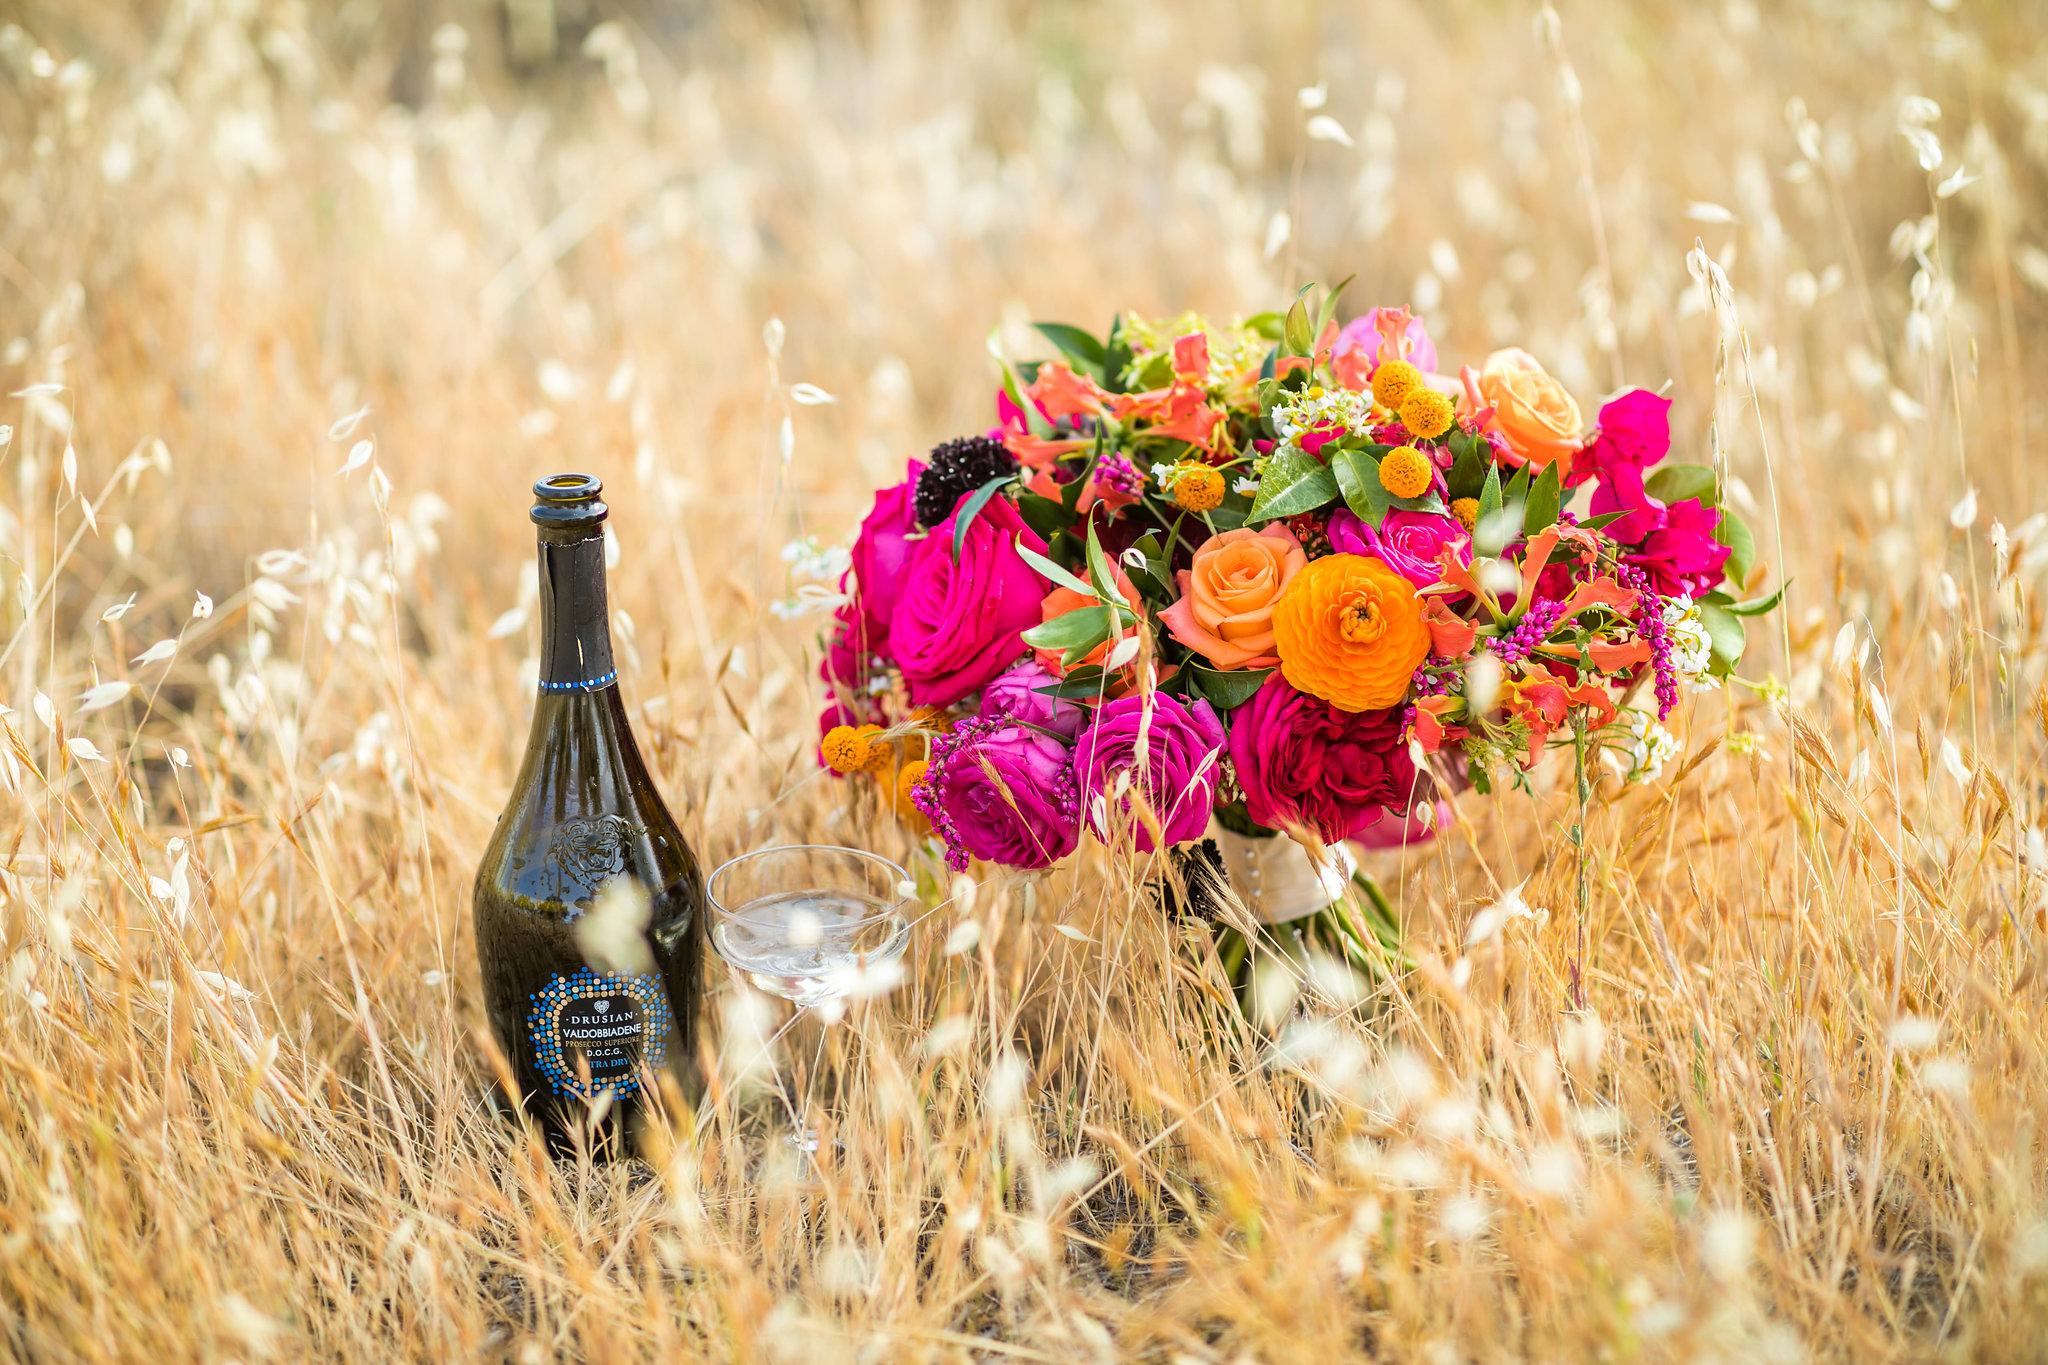 cameron_ingalls-the_farm_winery-madsen-0590 (1).jpg